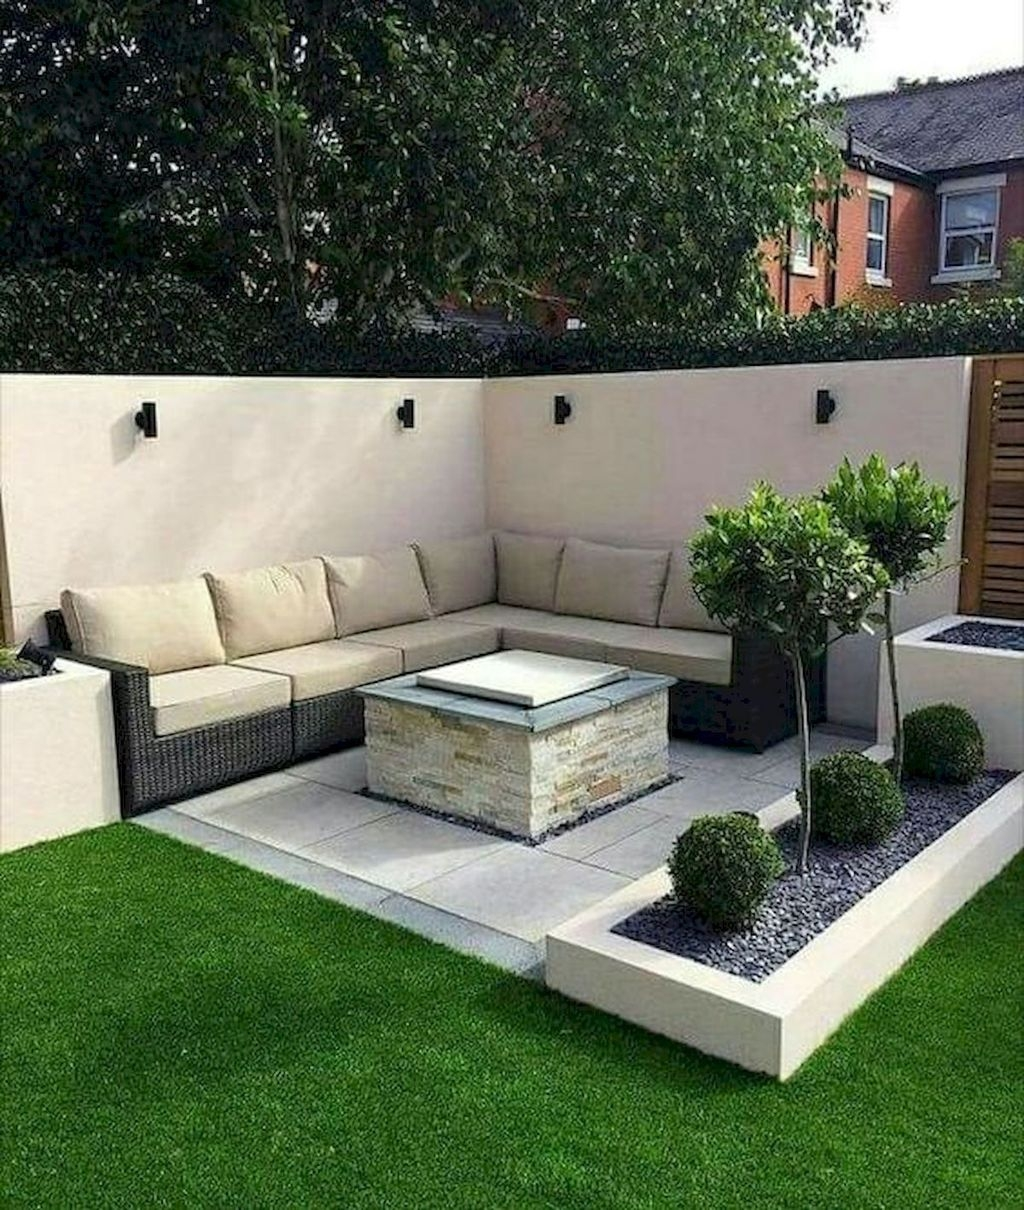 Awesome Modern Garden Architecture Design Ideas 15